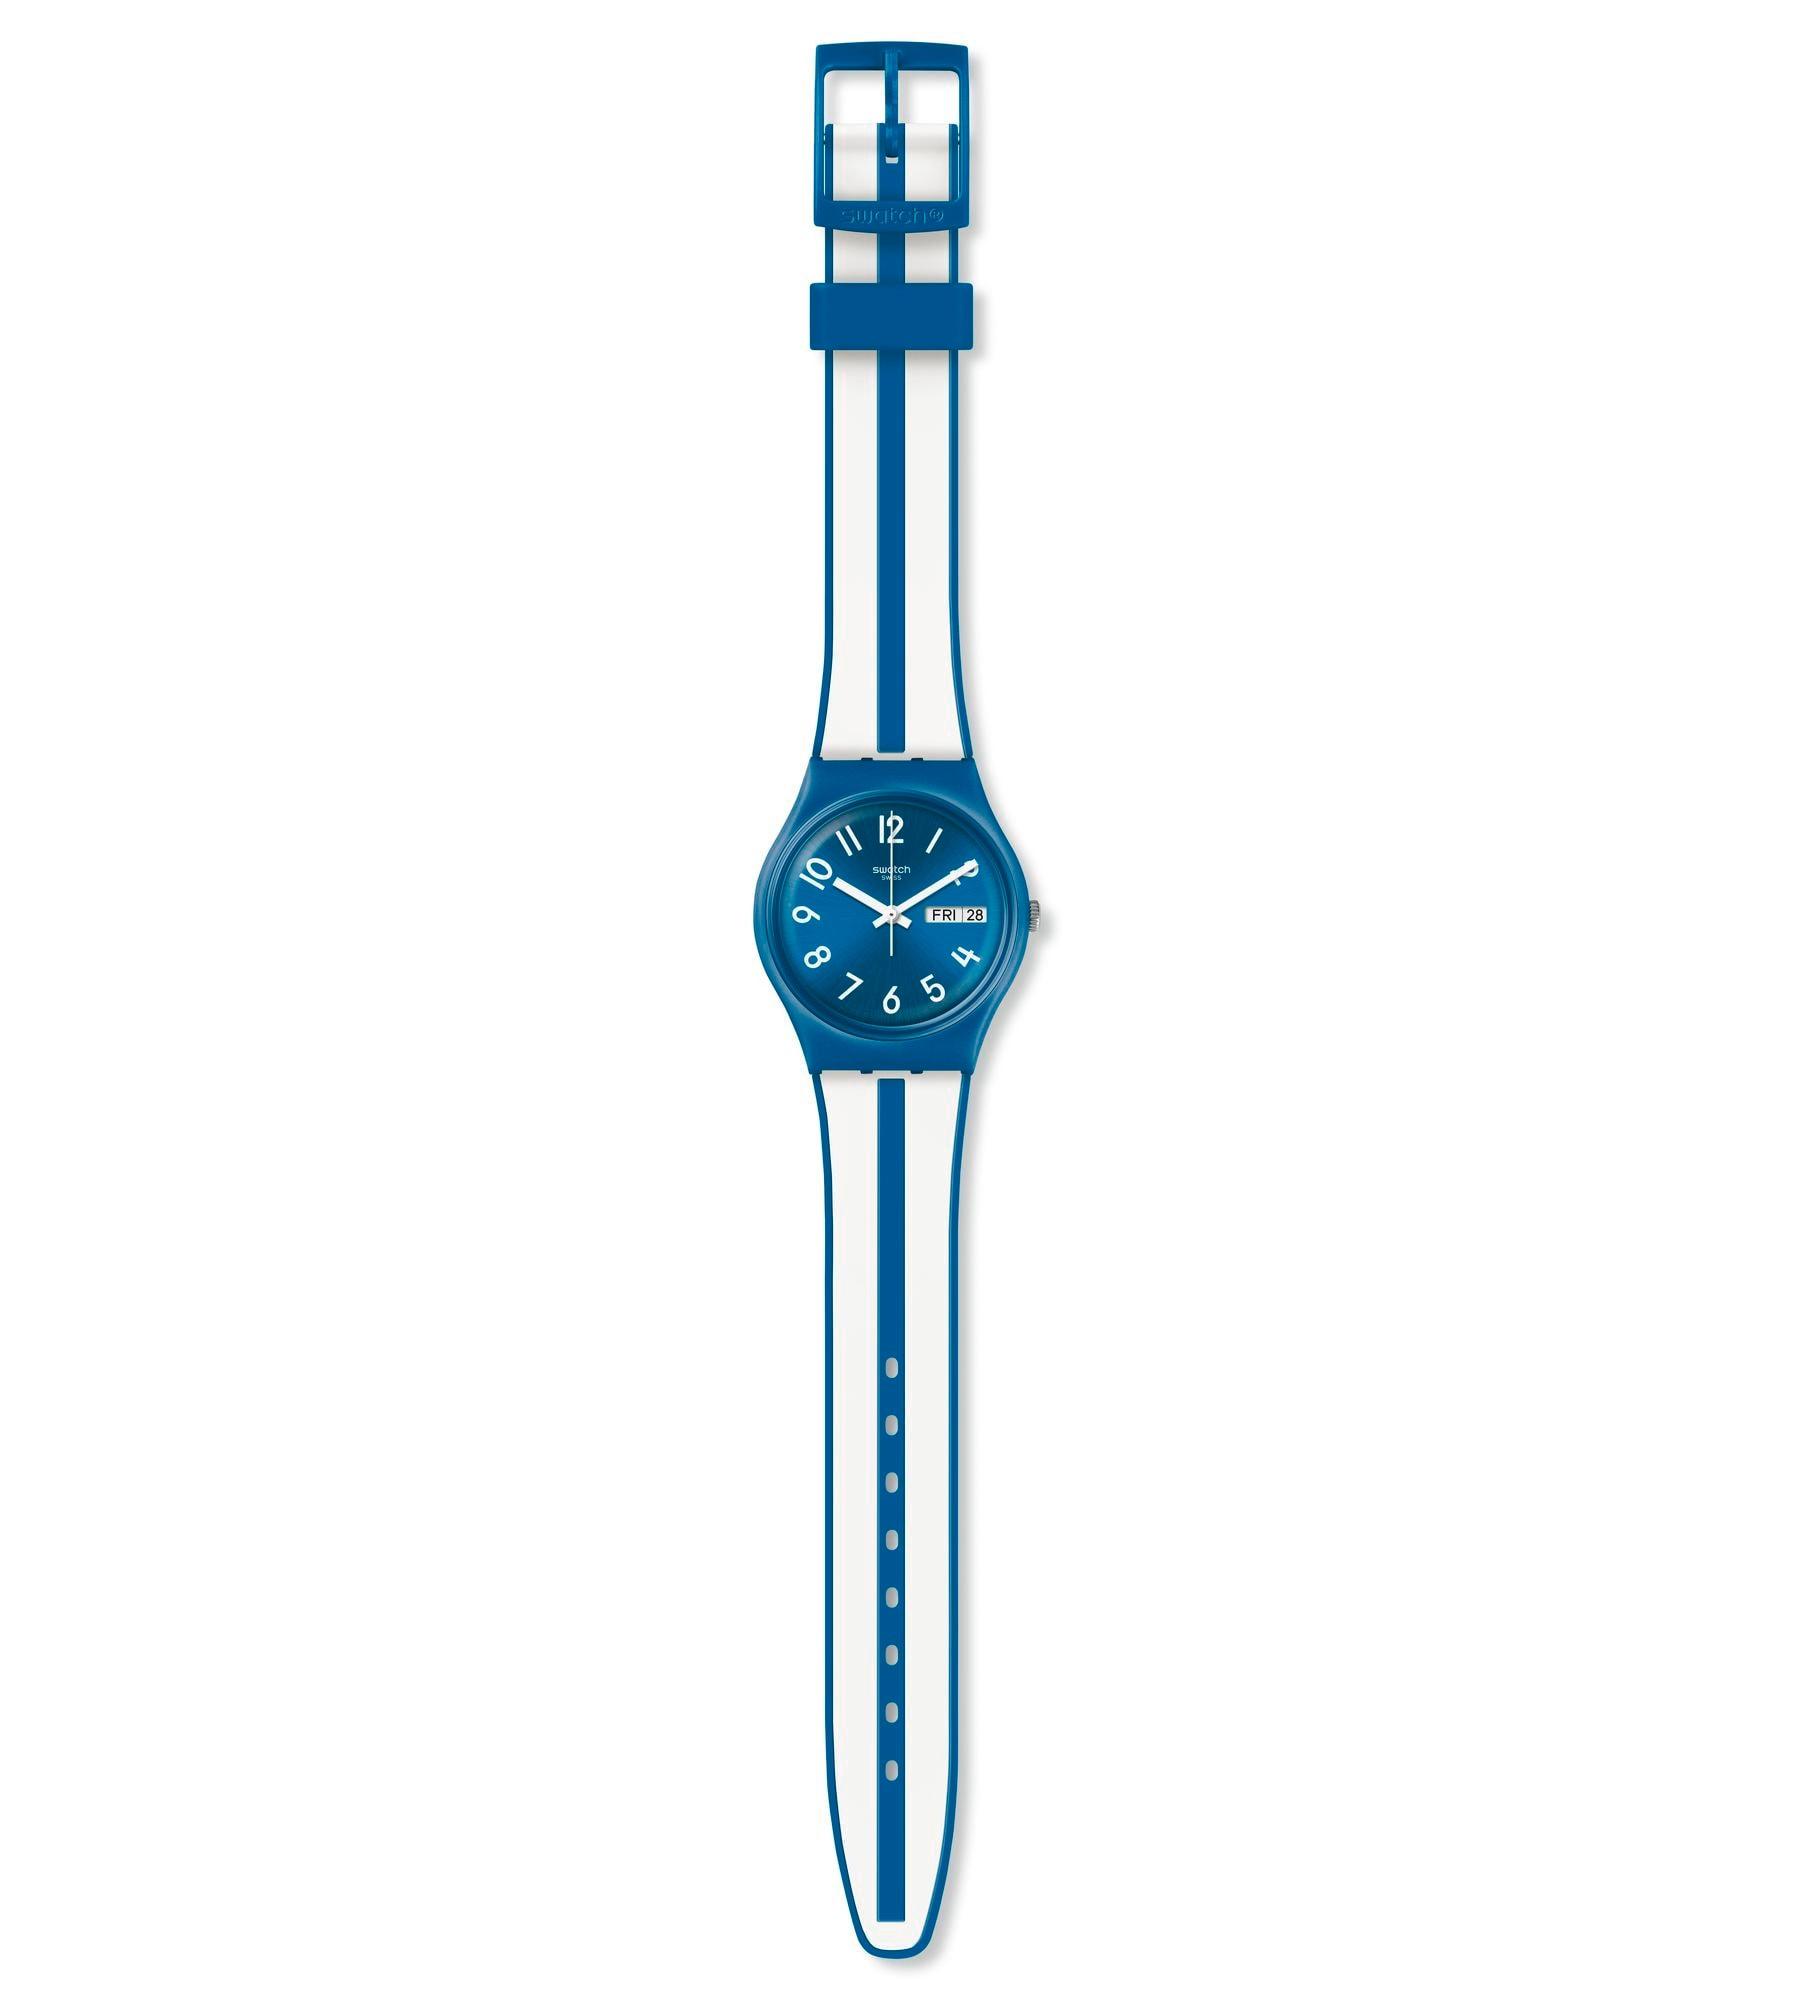 comprar baratas 17faf 50b0b Swatch® España - Gent (Ø 34 MM) ANISETTE GS702